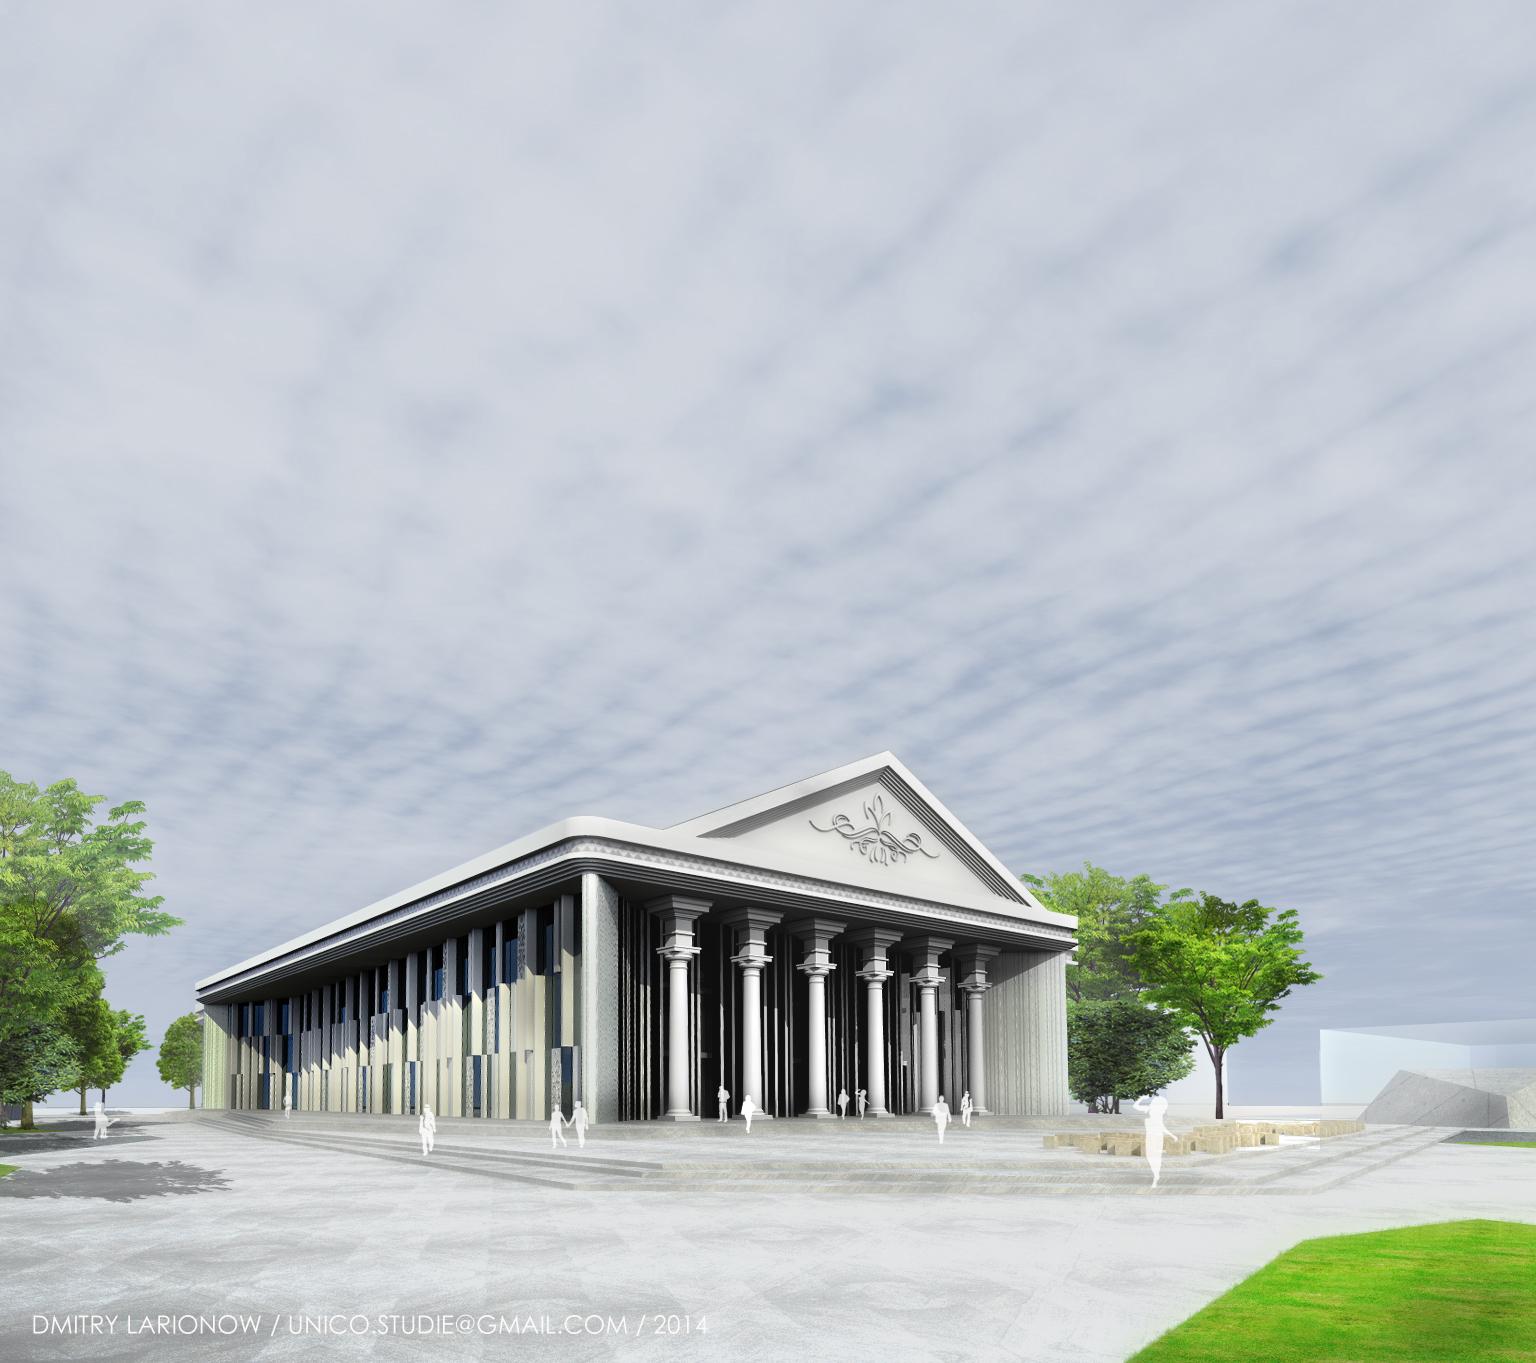 Разработка архитектурной концепции театра оперы и балета фото f_82152f672ba6b34c.jpg